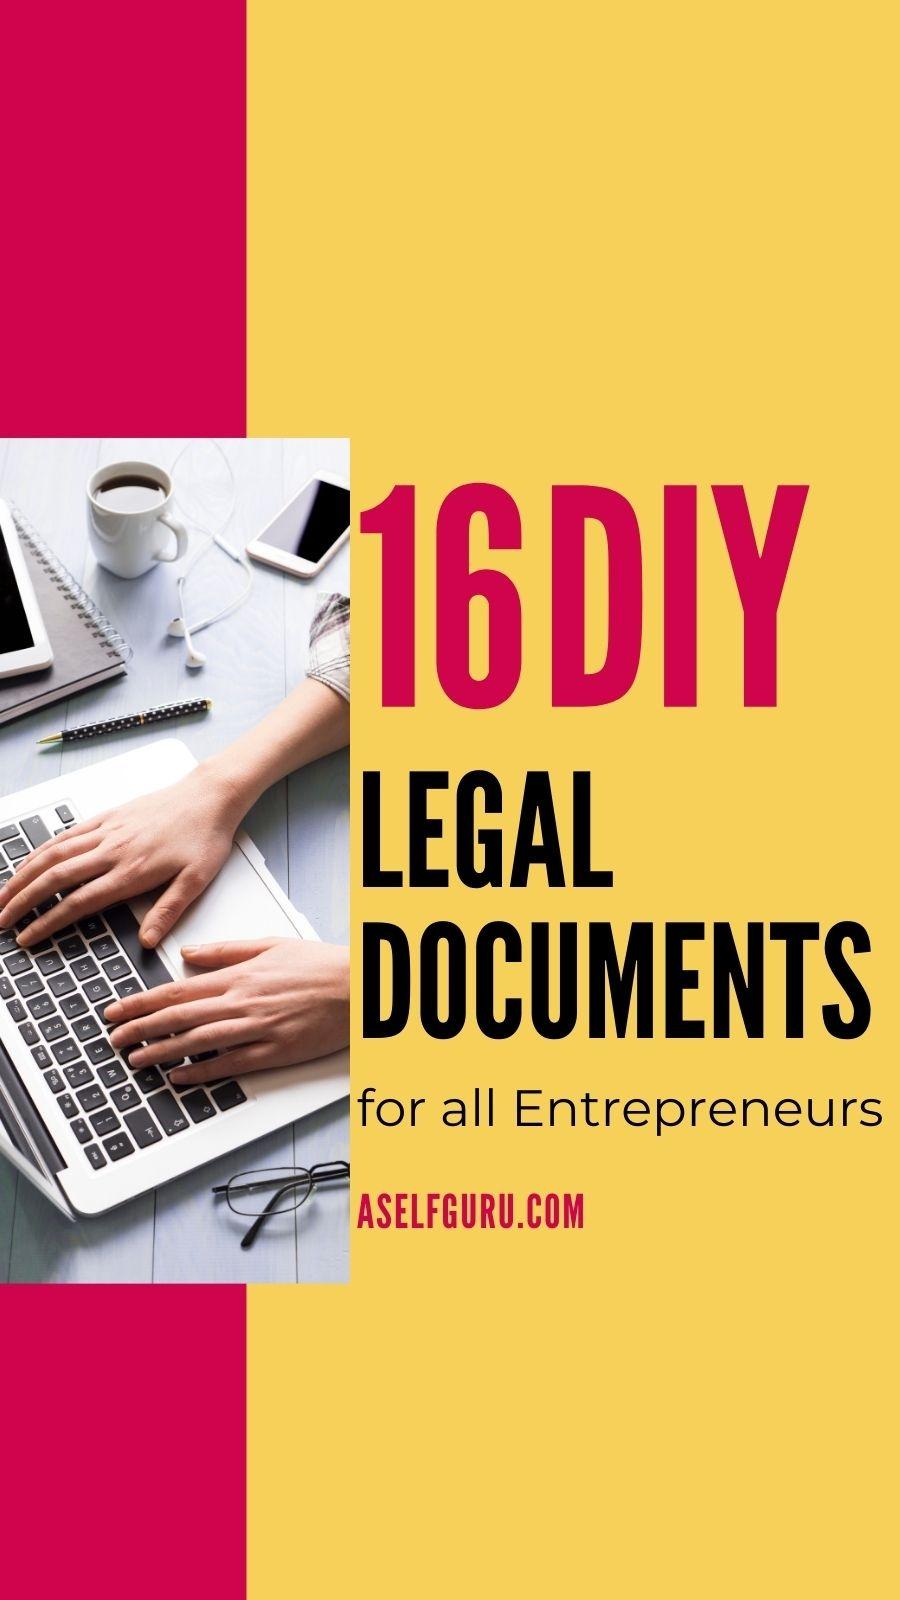 16 DIY Legal Documents For All Entrepreneurs